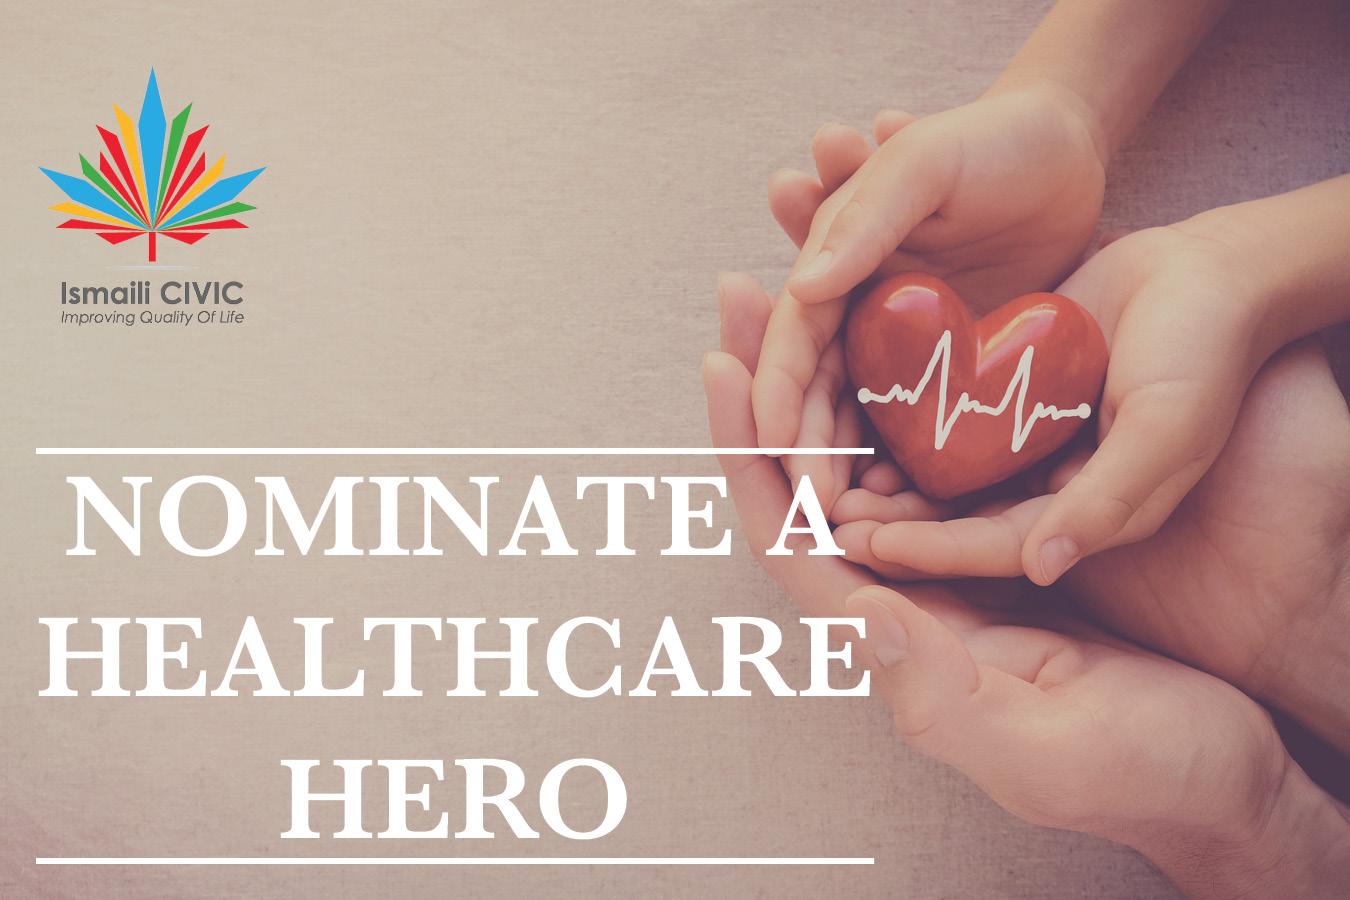 Nominate a Healthcare Hero